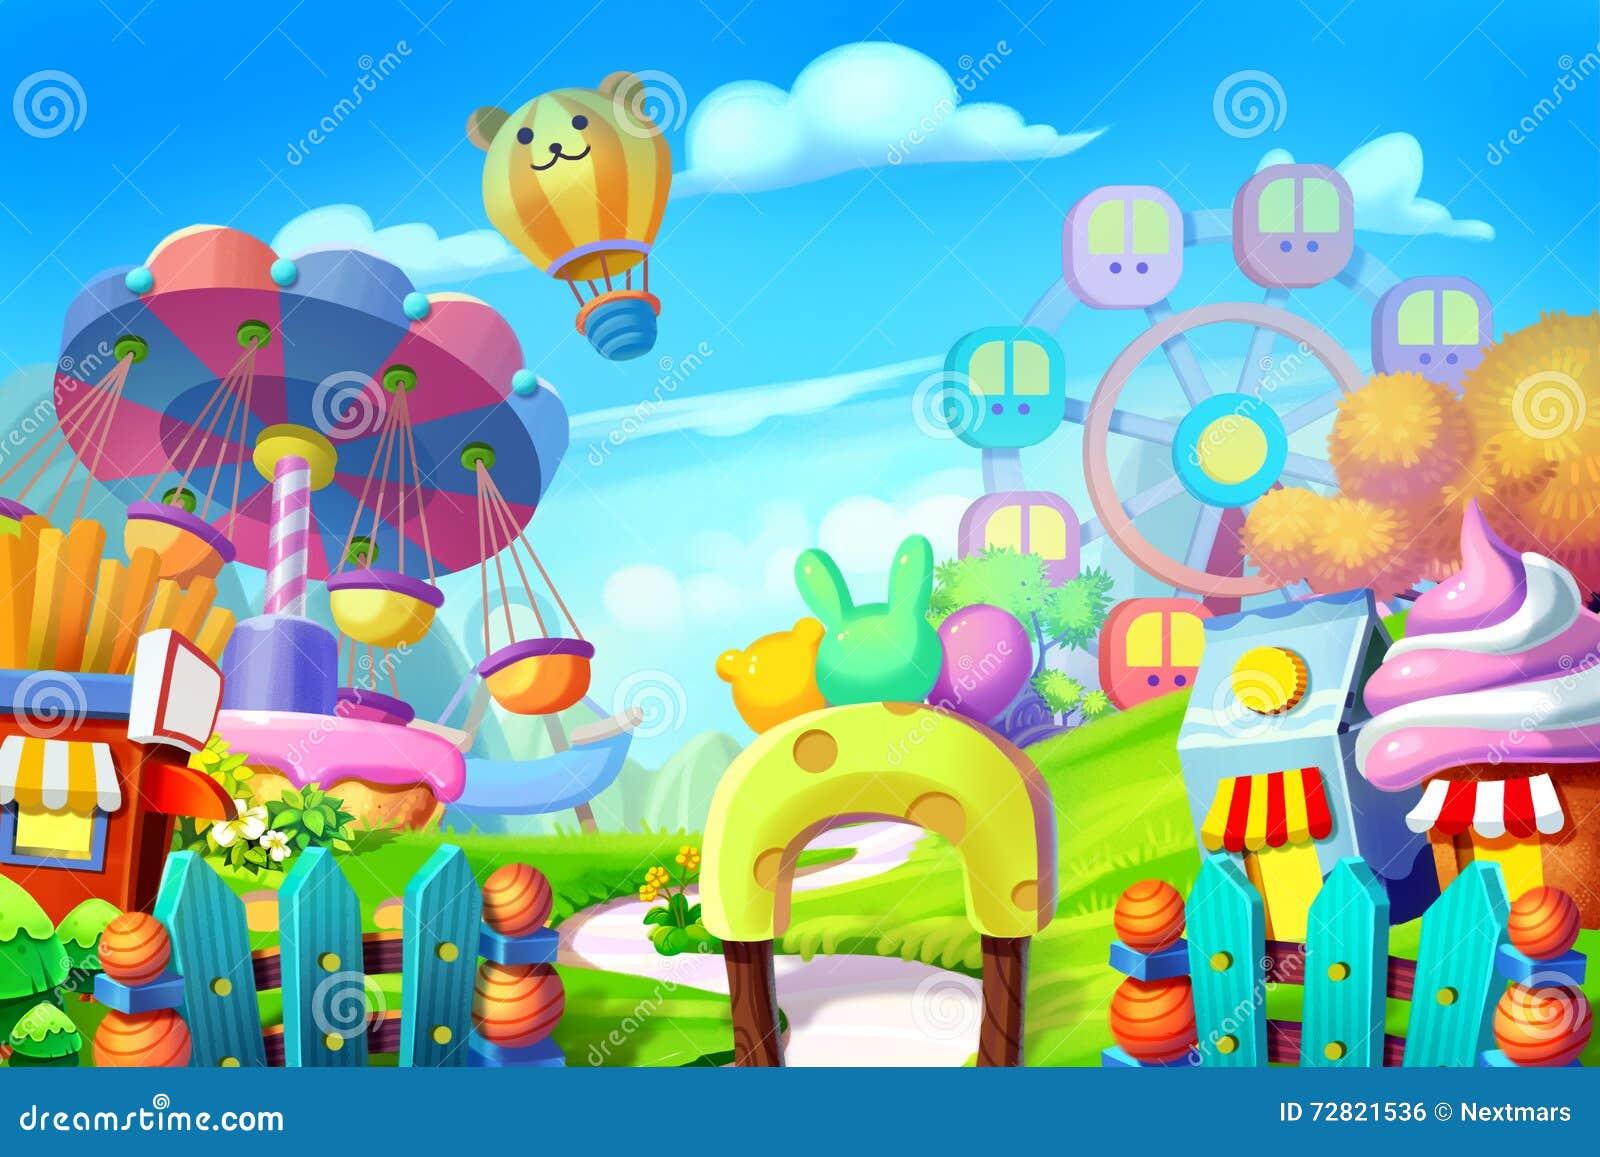 Creative Illustration and Innovative Art: Background Set: Colorful Playground, Amusement Park.